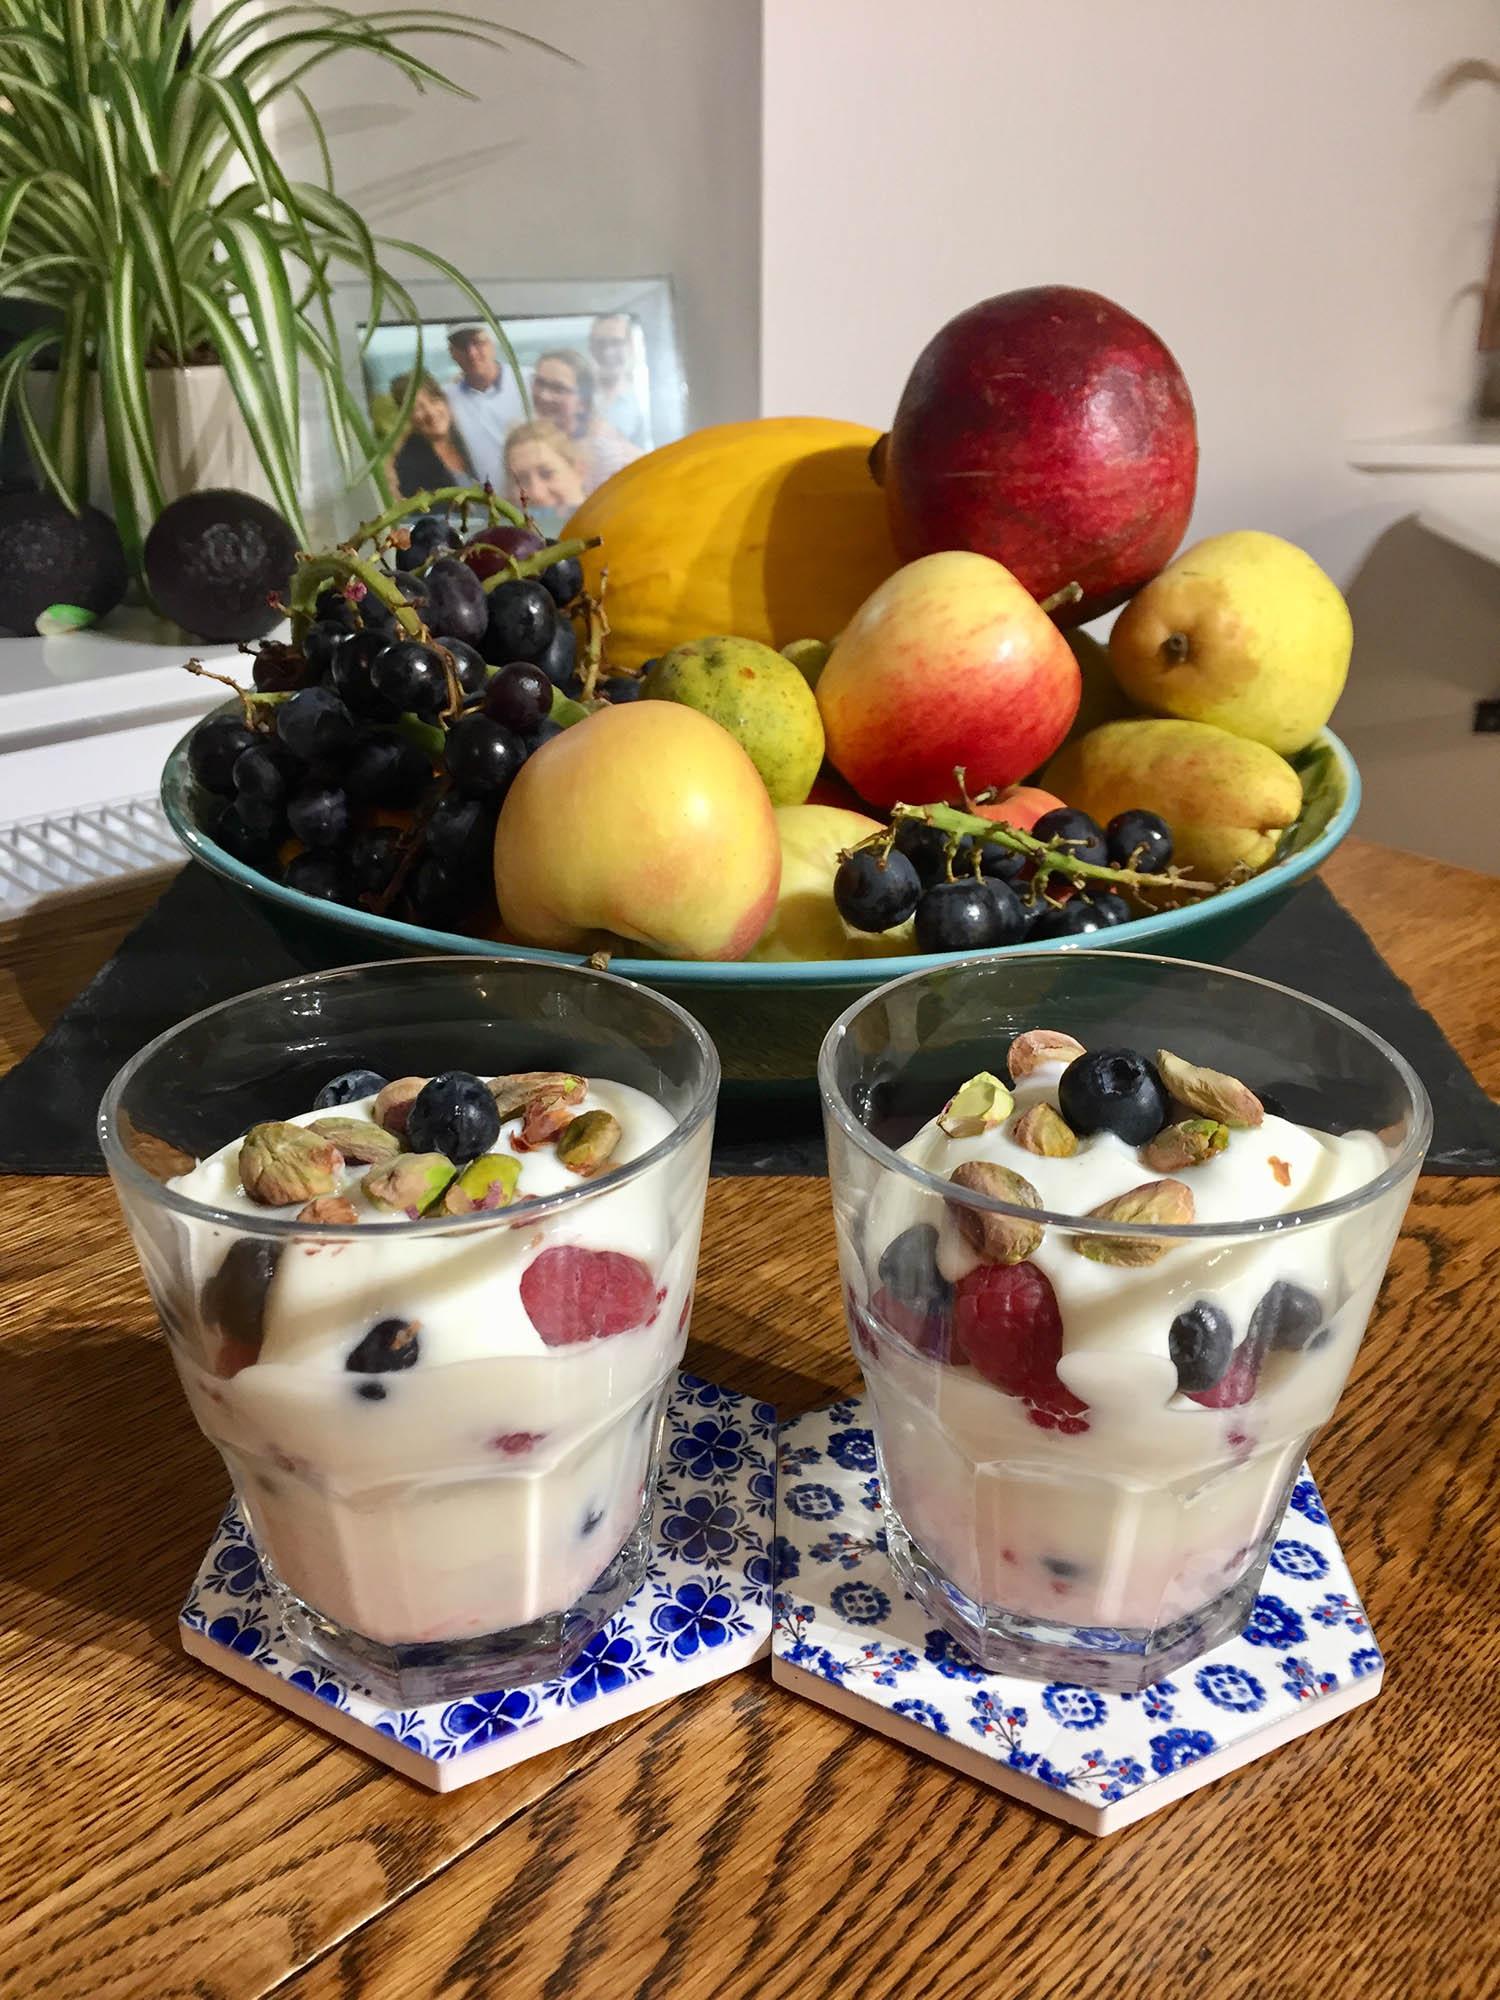 Slimming world yoghurt dessert